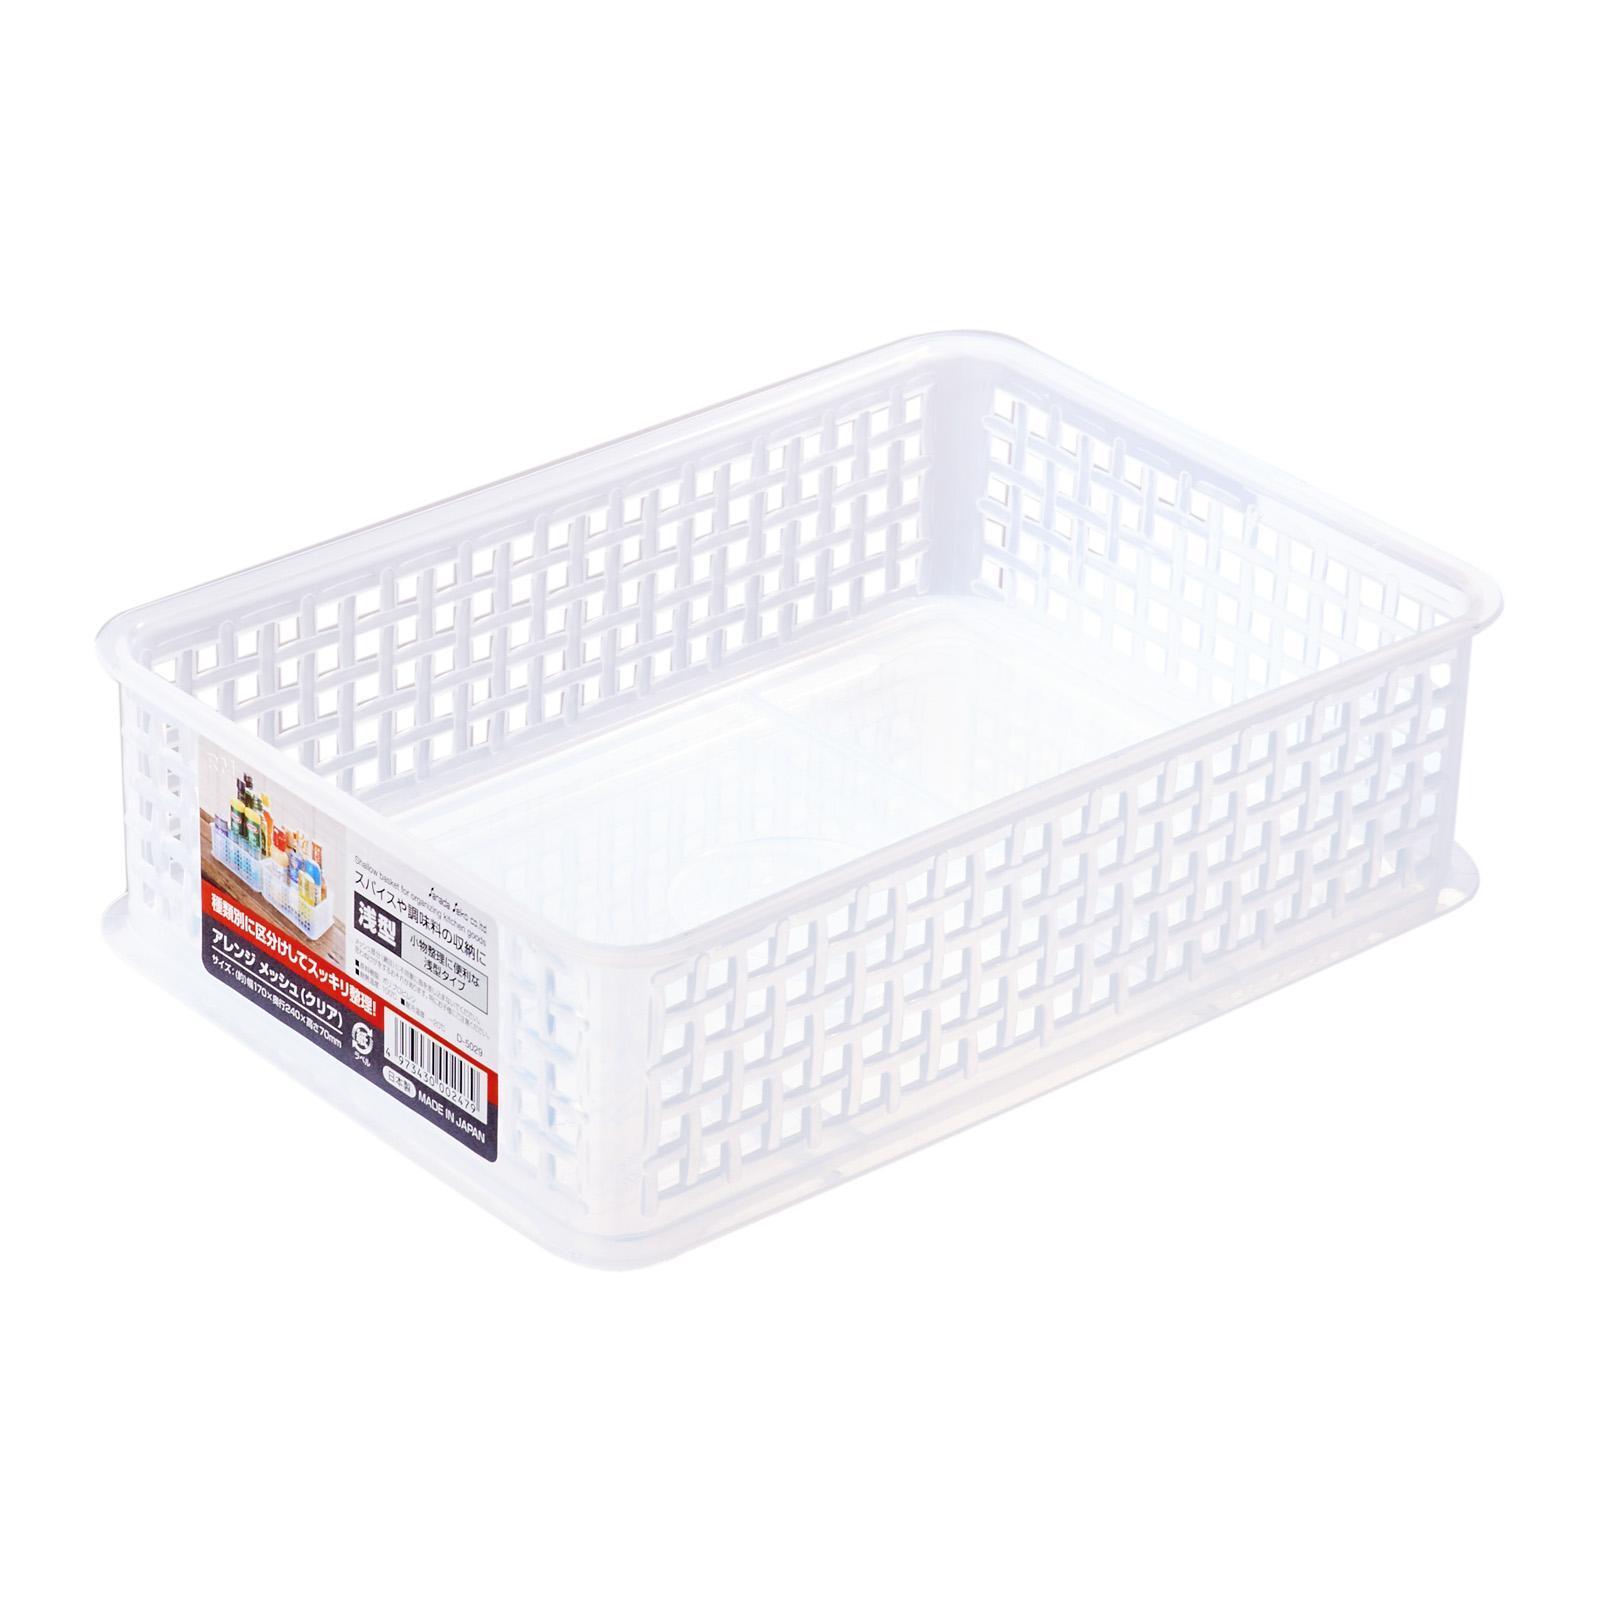 Sanada Seiko Storage Basket Mesh/Clear